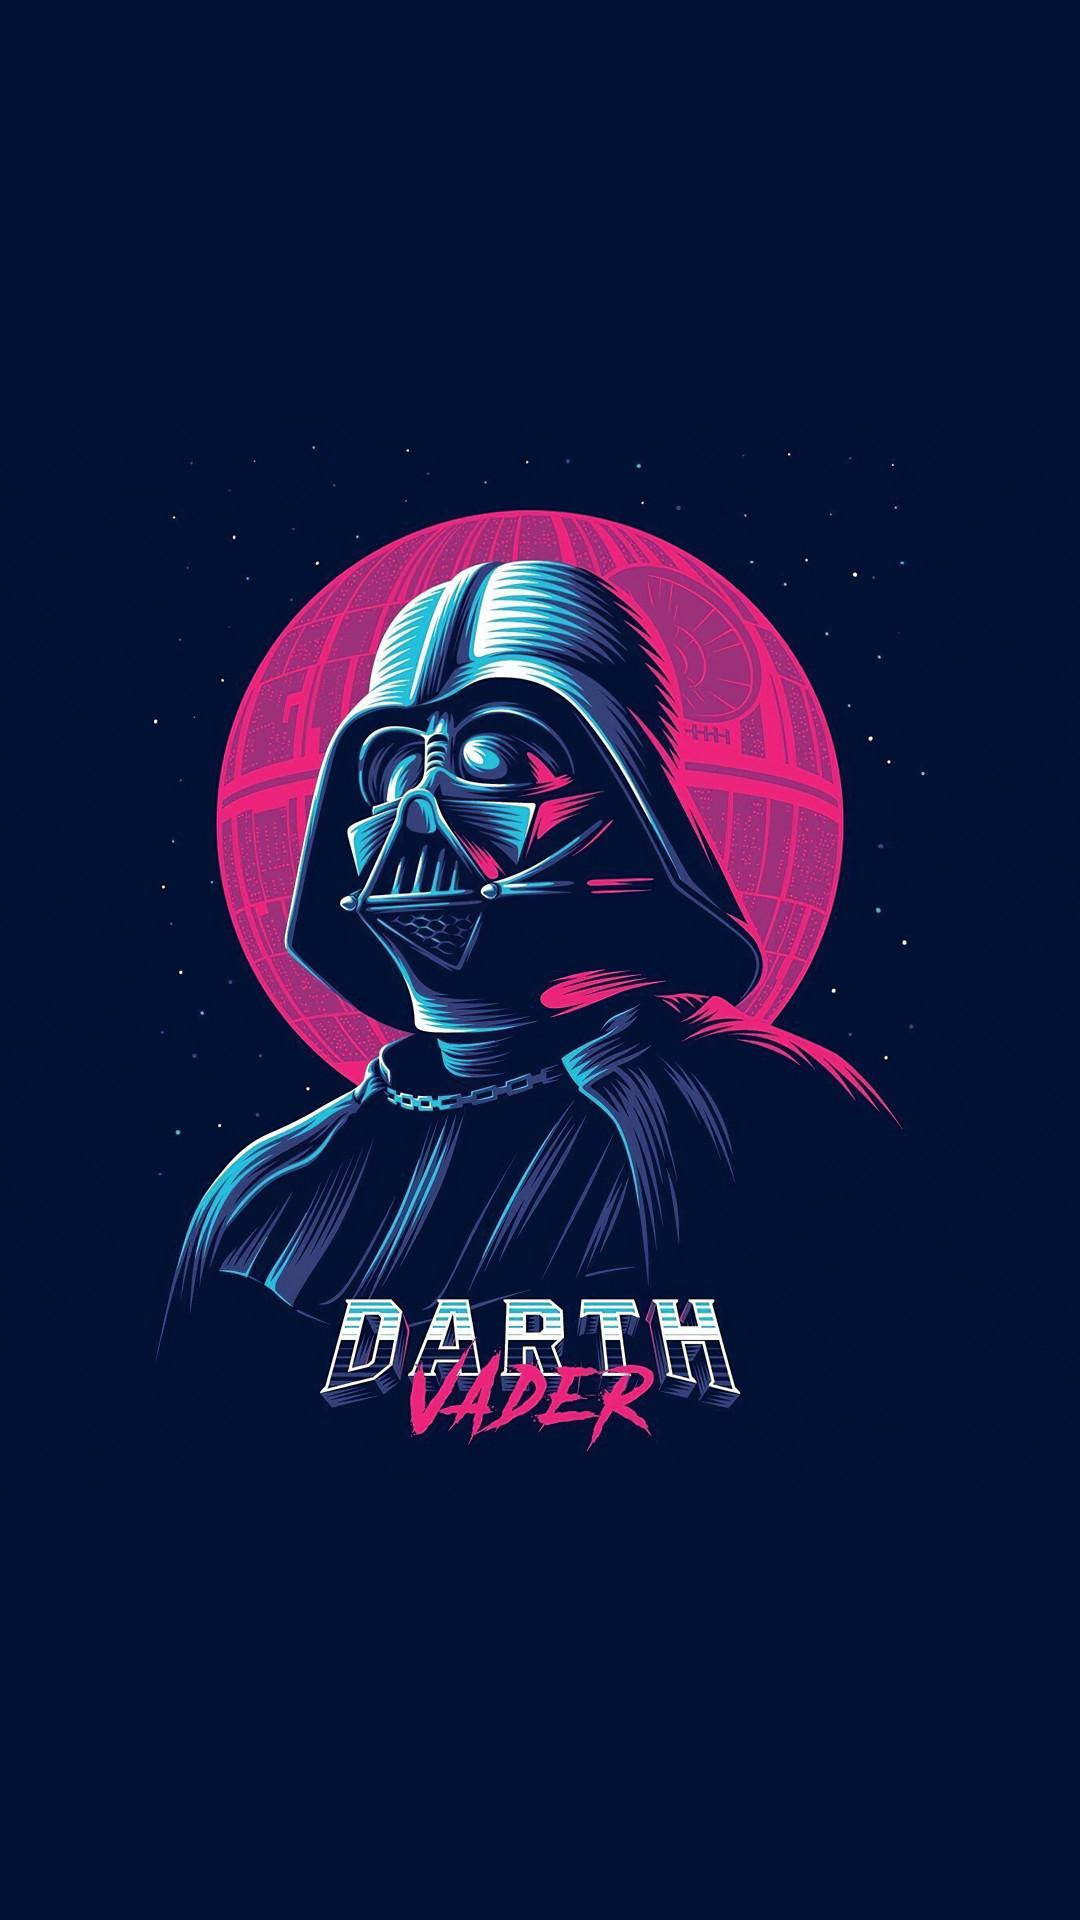 Darth Vader Minimalist Art wallpaper Cool Backgrounds 1080x1920